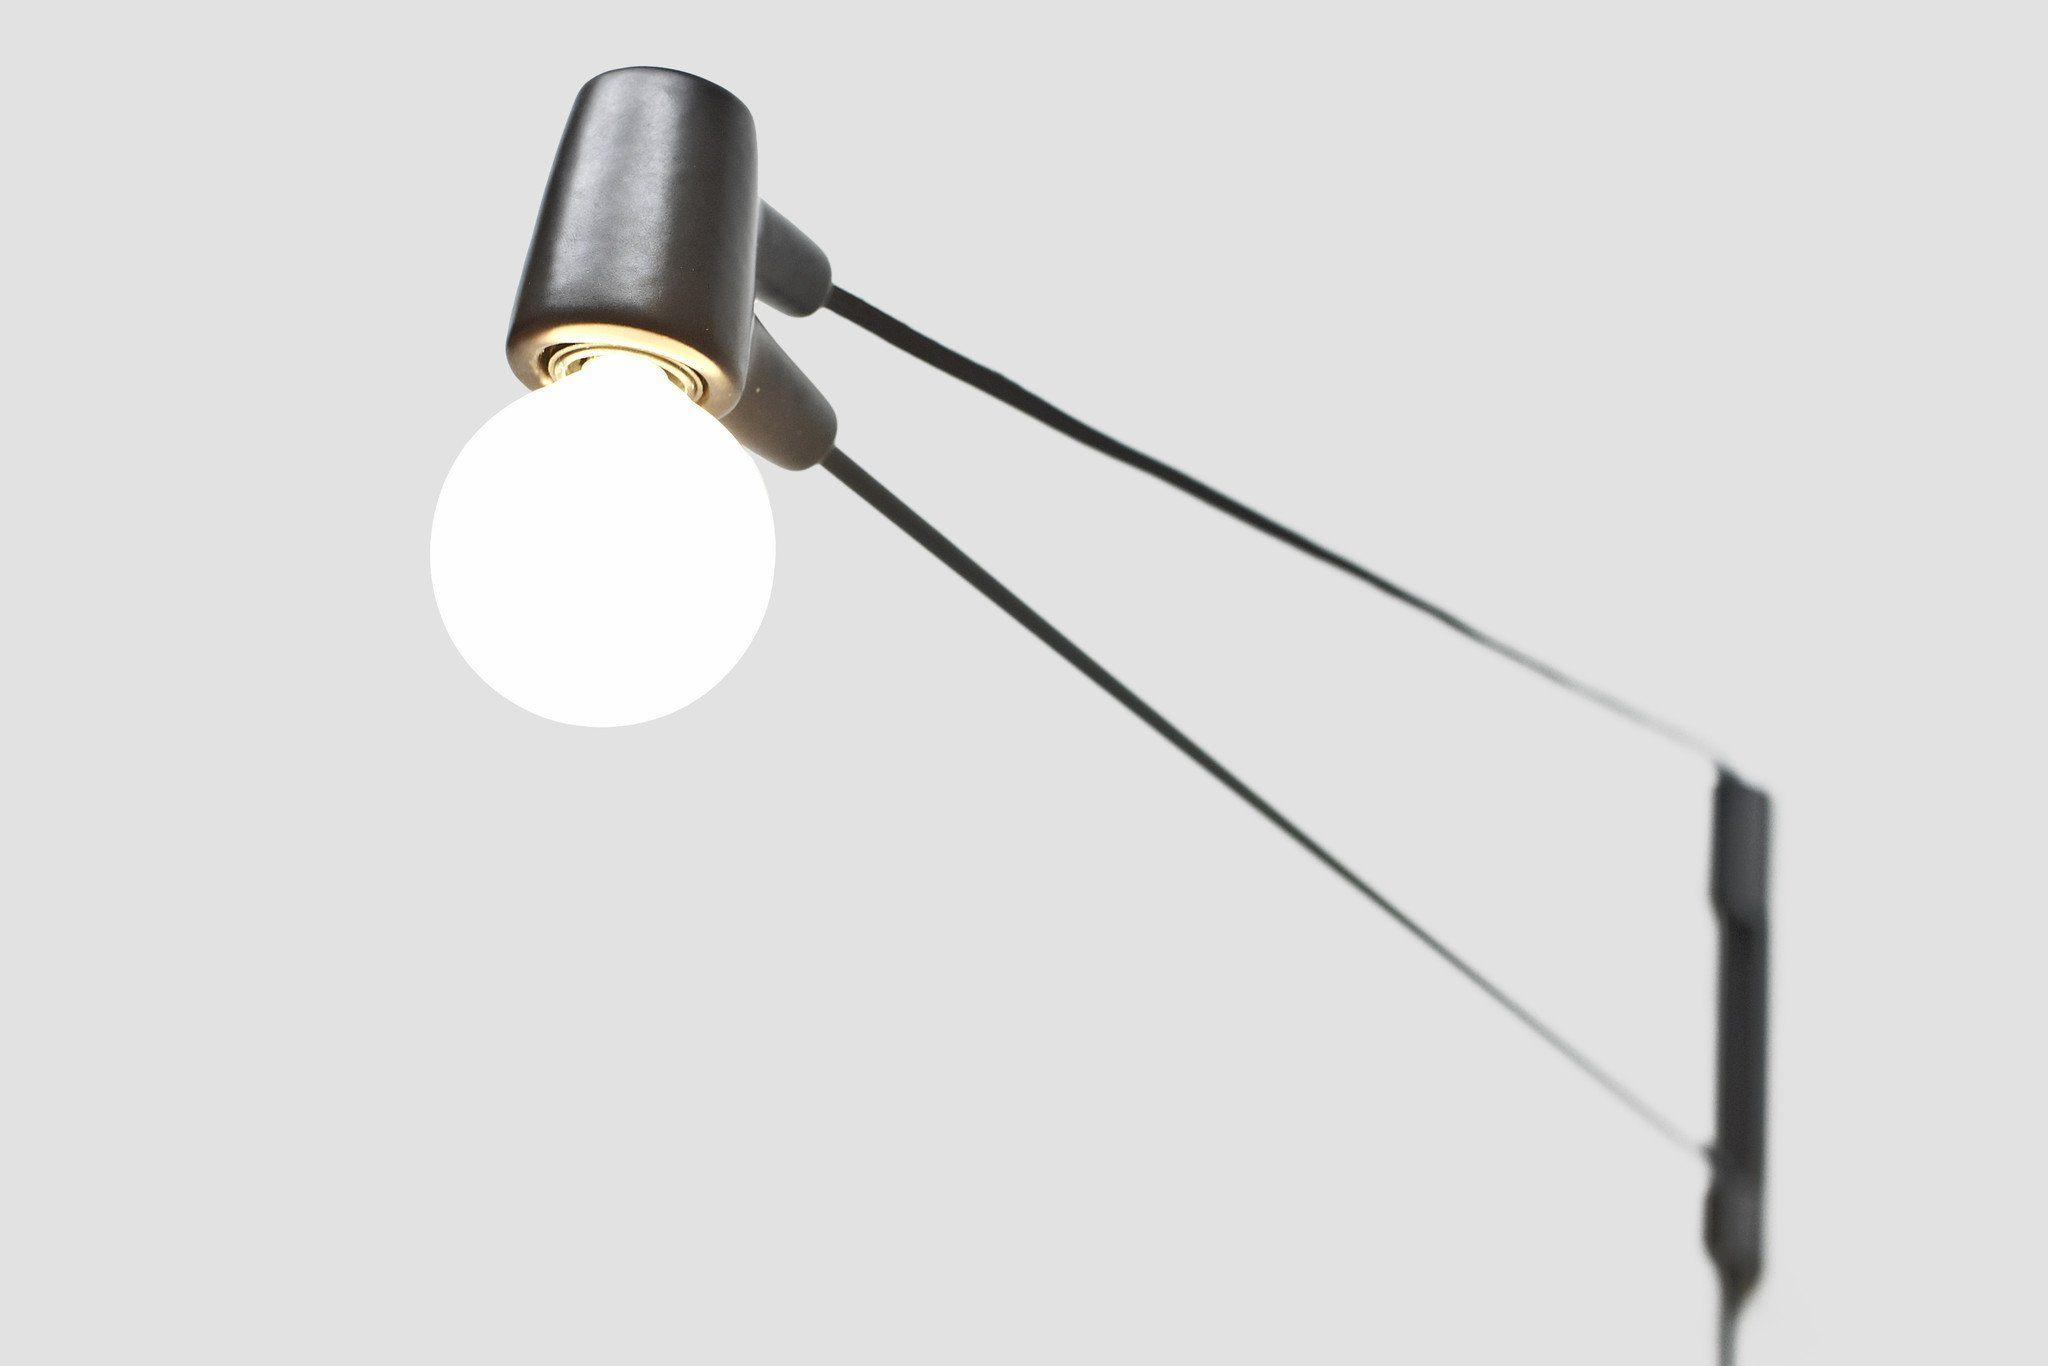 Cord Lamp Lighting Pinterest Cable Studio Design And Lights - Modern-swing-pendant-light-by-monochro-design-studio